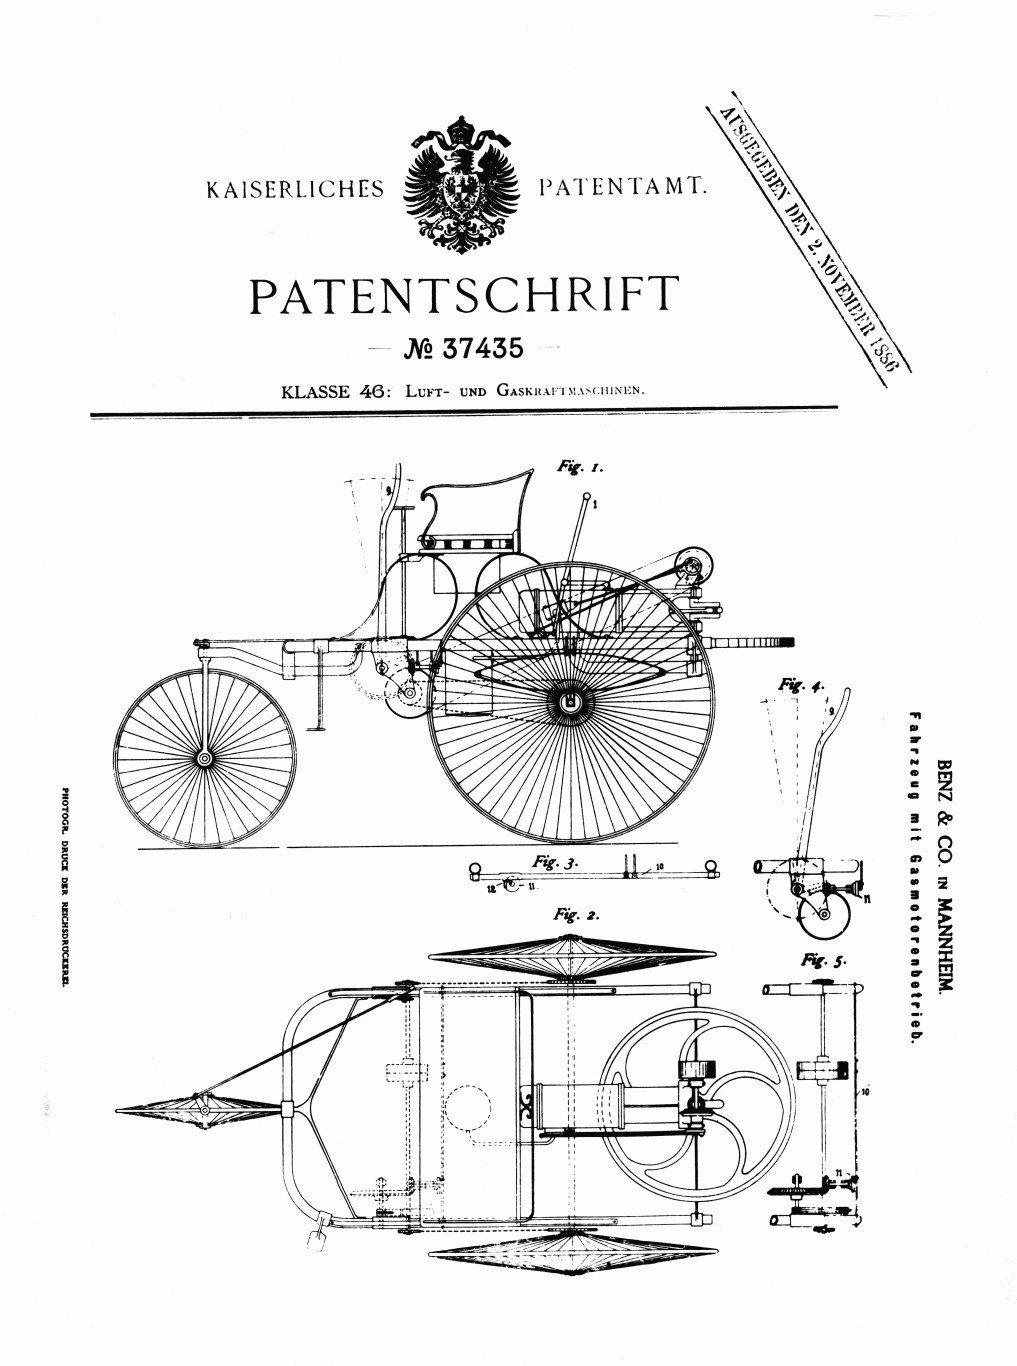 Benz Patent 1886 motorwagen the first motorcar